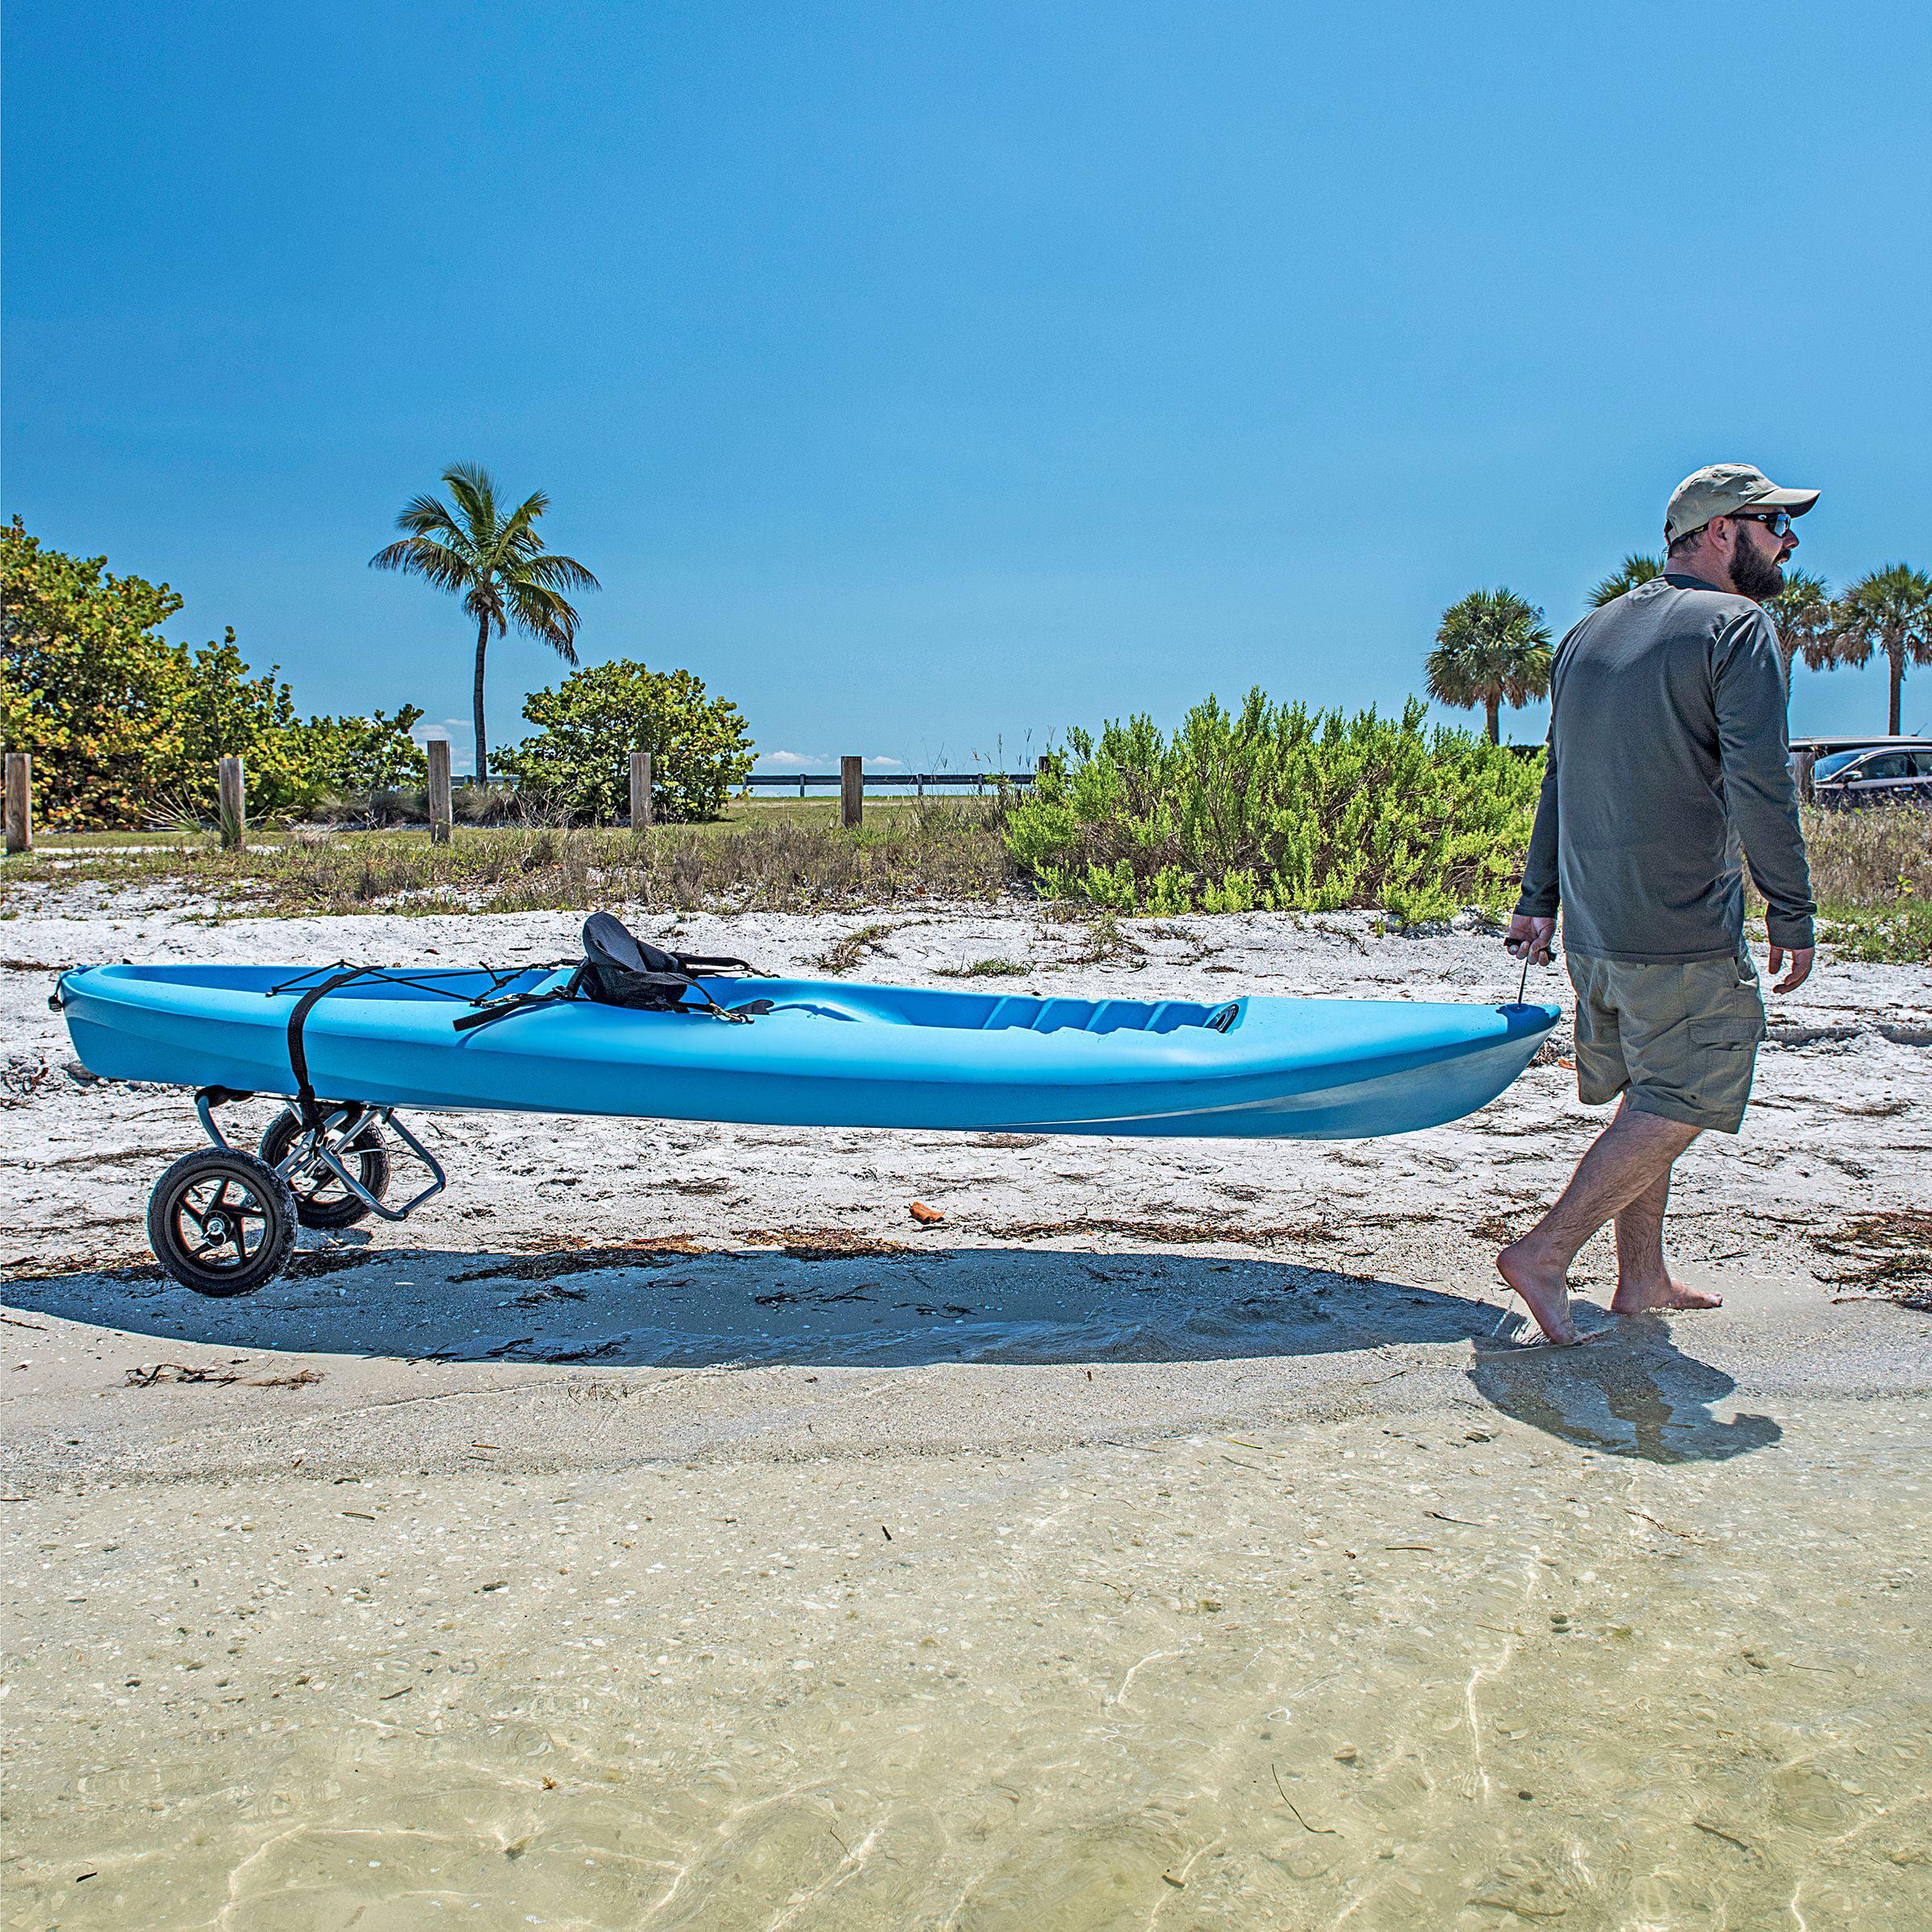 Propel Paddle Gear Kayak Accessories Aluminum Wheel Carrier by Shoreline Marine